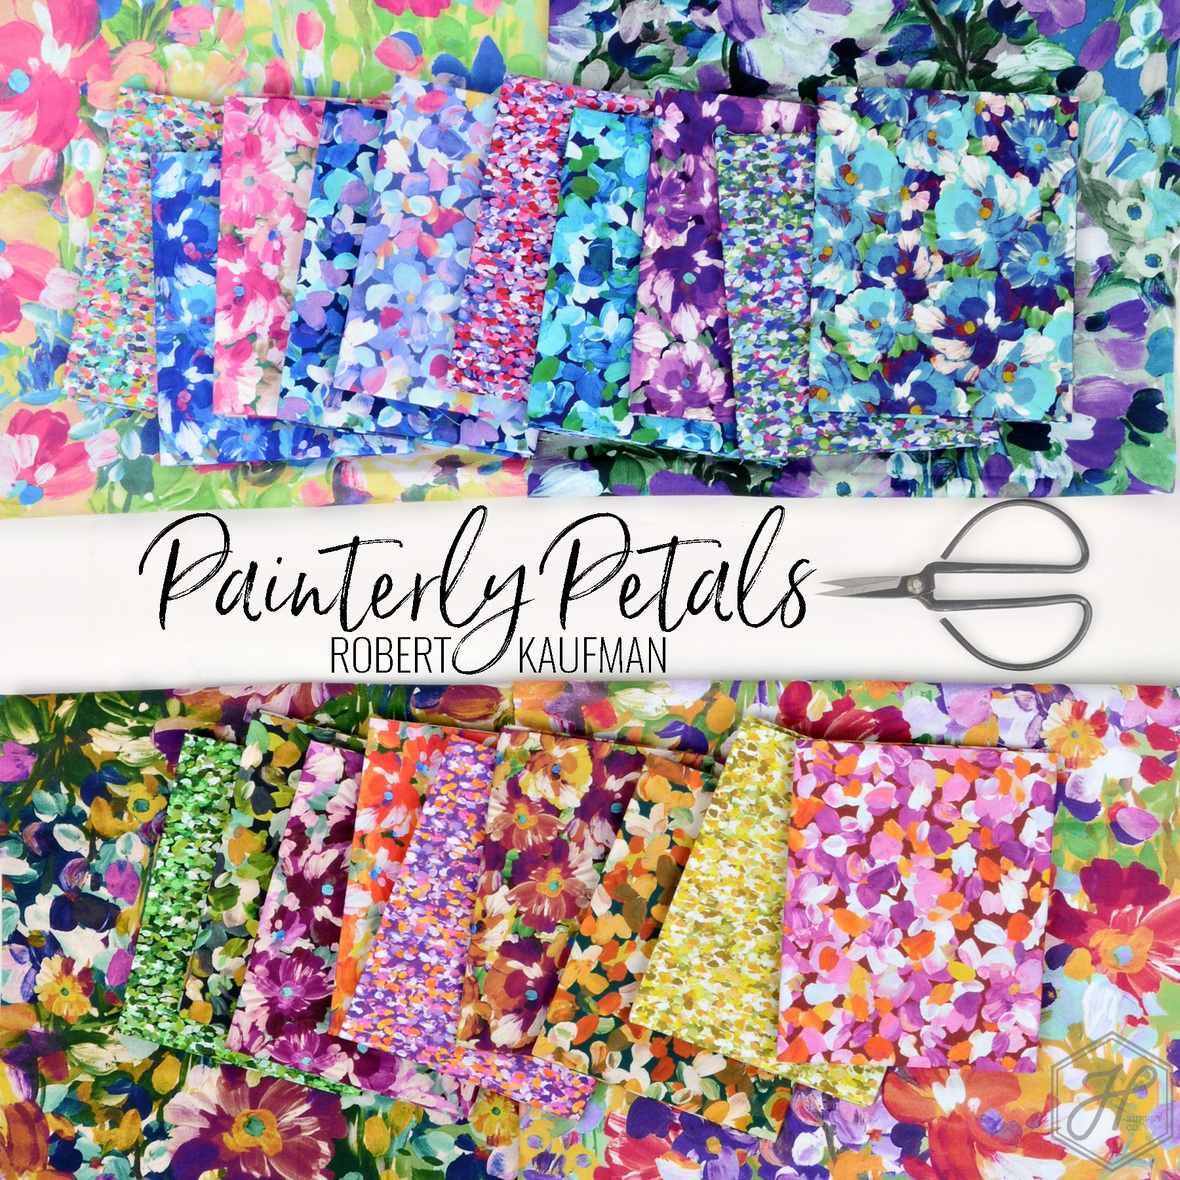 Painterly-Petals-2-Fabric-Robert-Kaufman-at-Hawthorne-Supply-Co